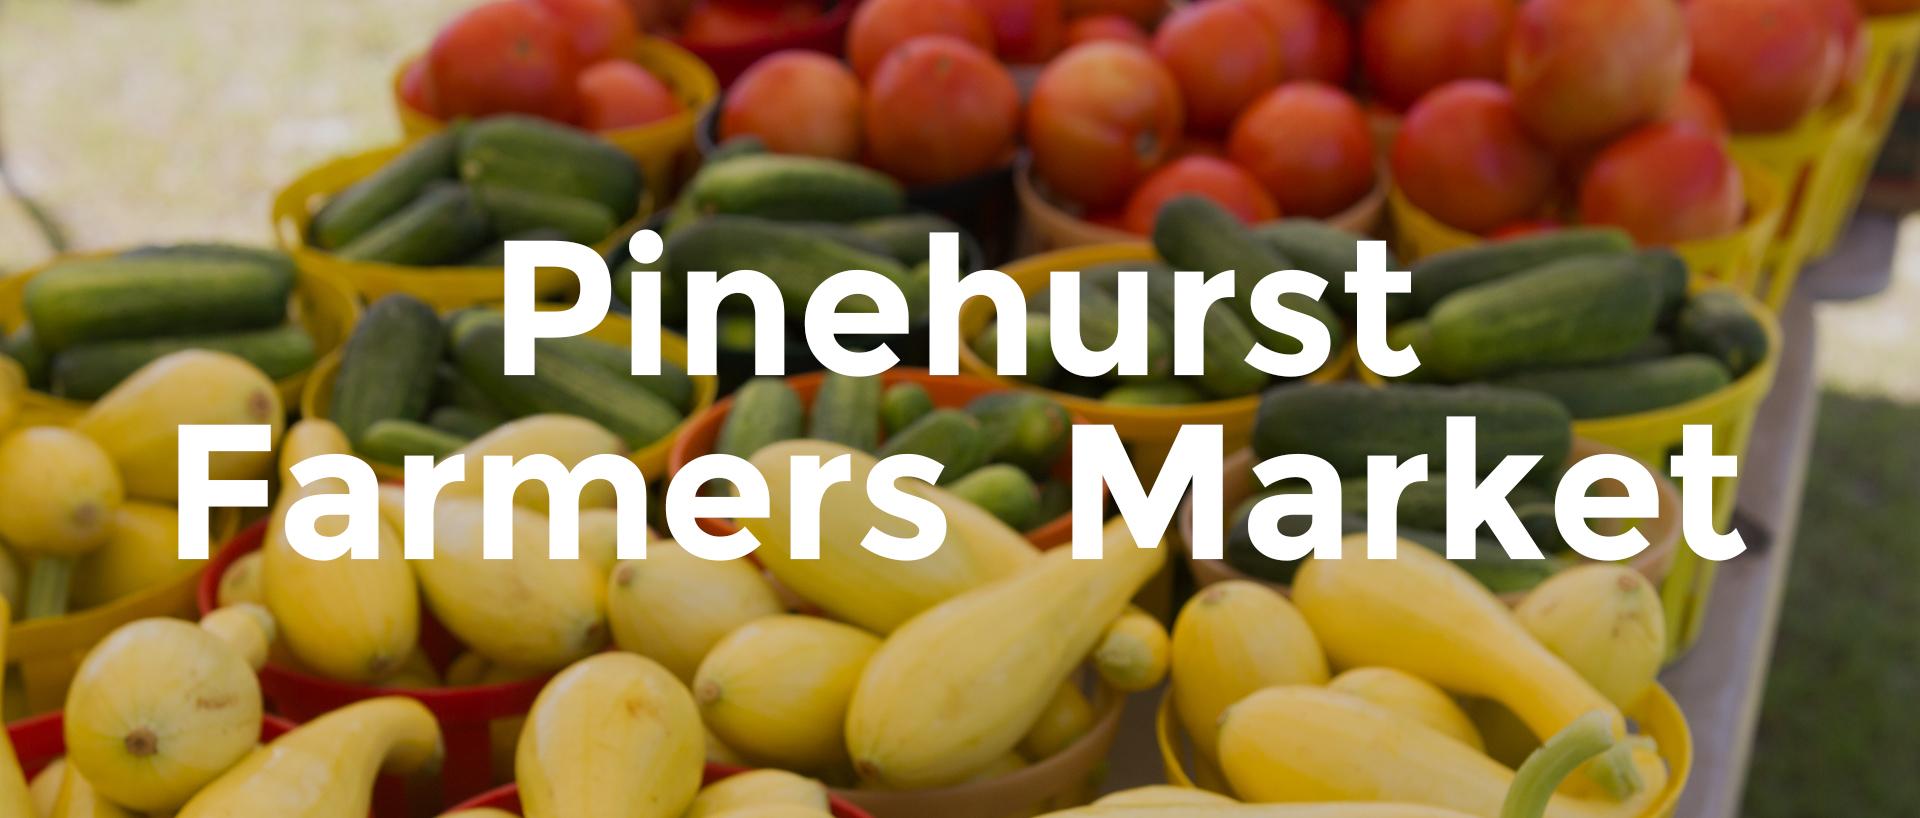 FarmerMarket__Web.jpg